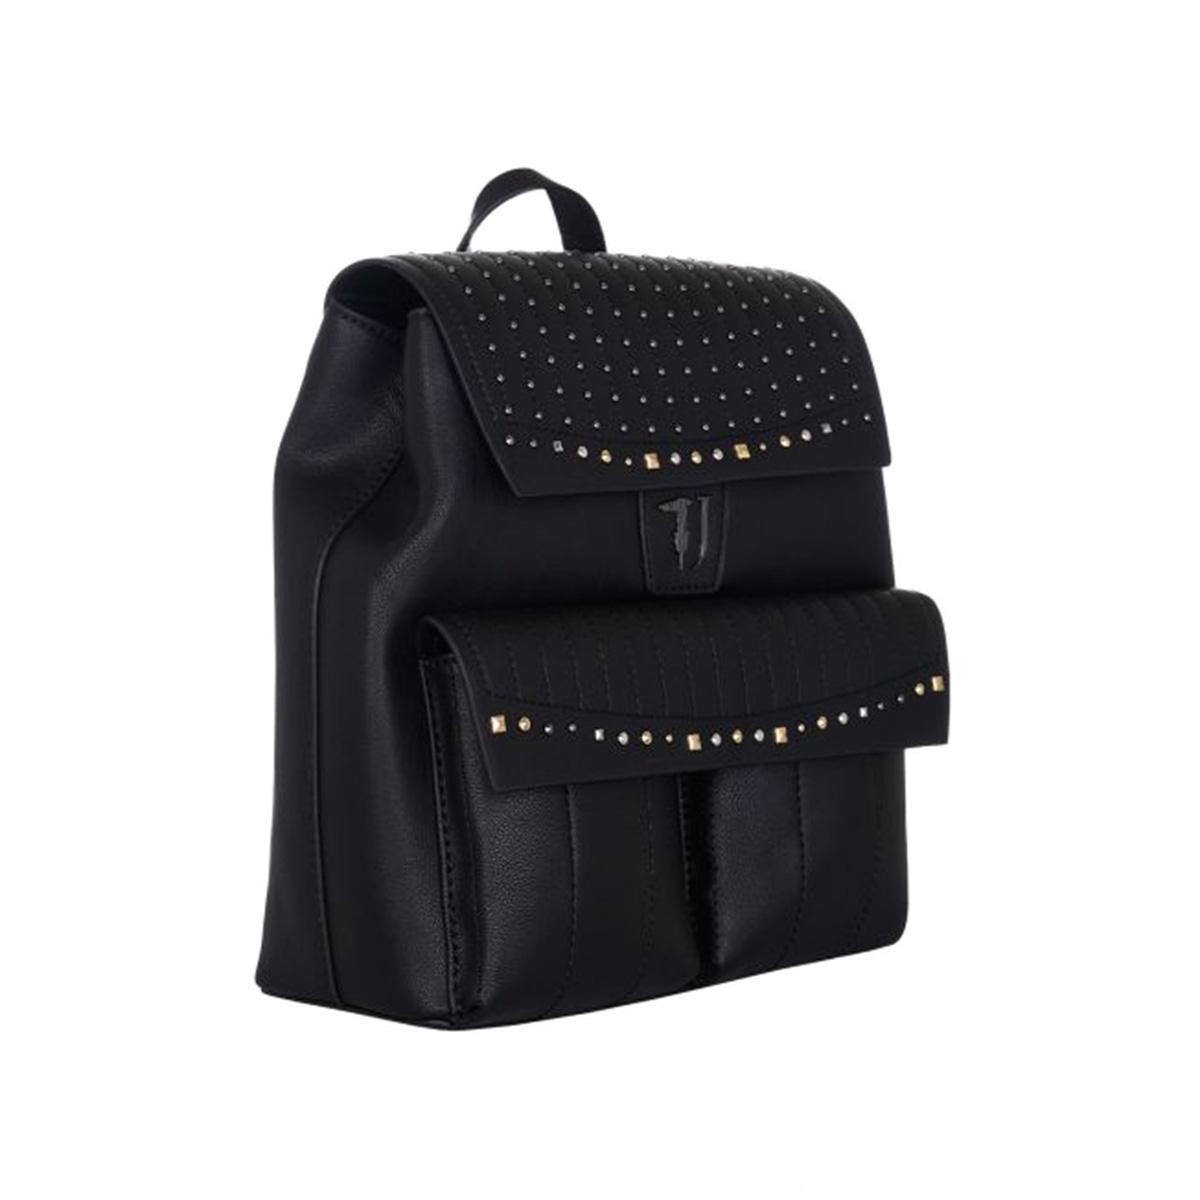 6215c053ee Σακίδιο Πλάτης Με Τρουκς Trussardi Jeans Curcuma Backpack 75B00508 Μαύρο